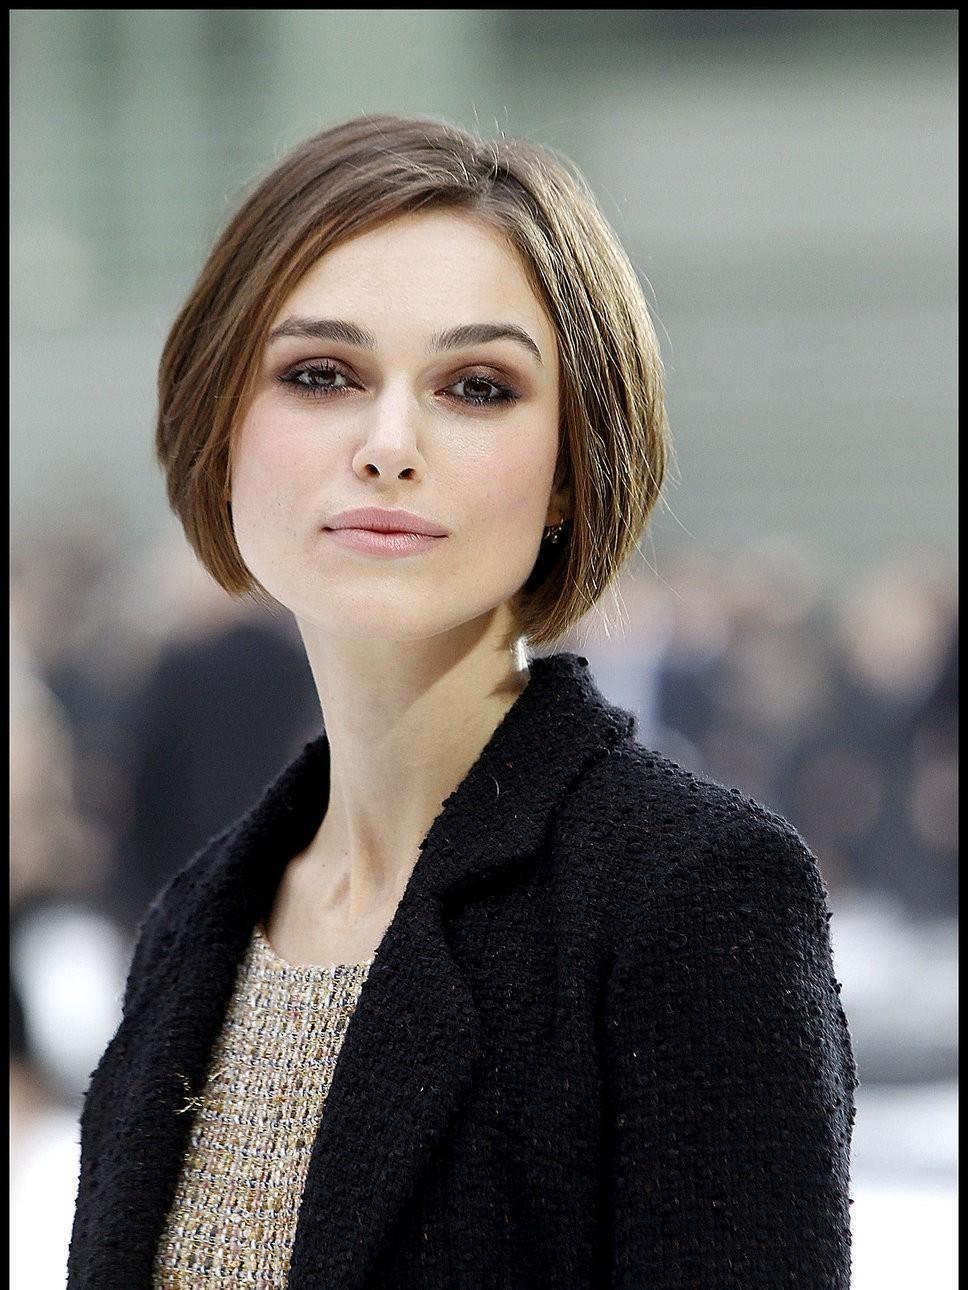 Chanel Hair Style keira knightley bob hairstyle pinterest 2549 by stevesalt.us